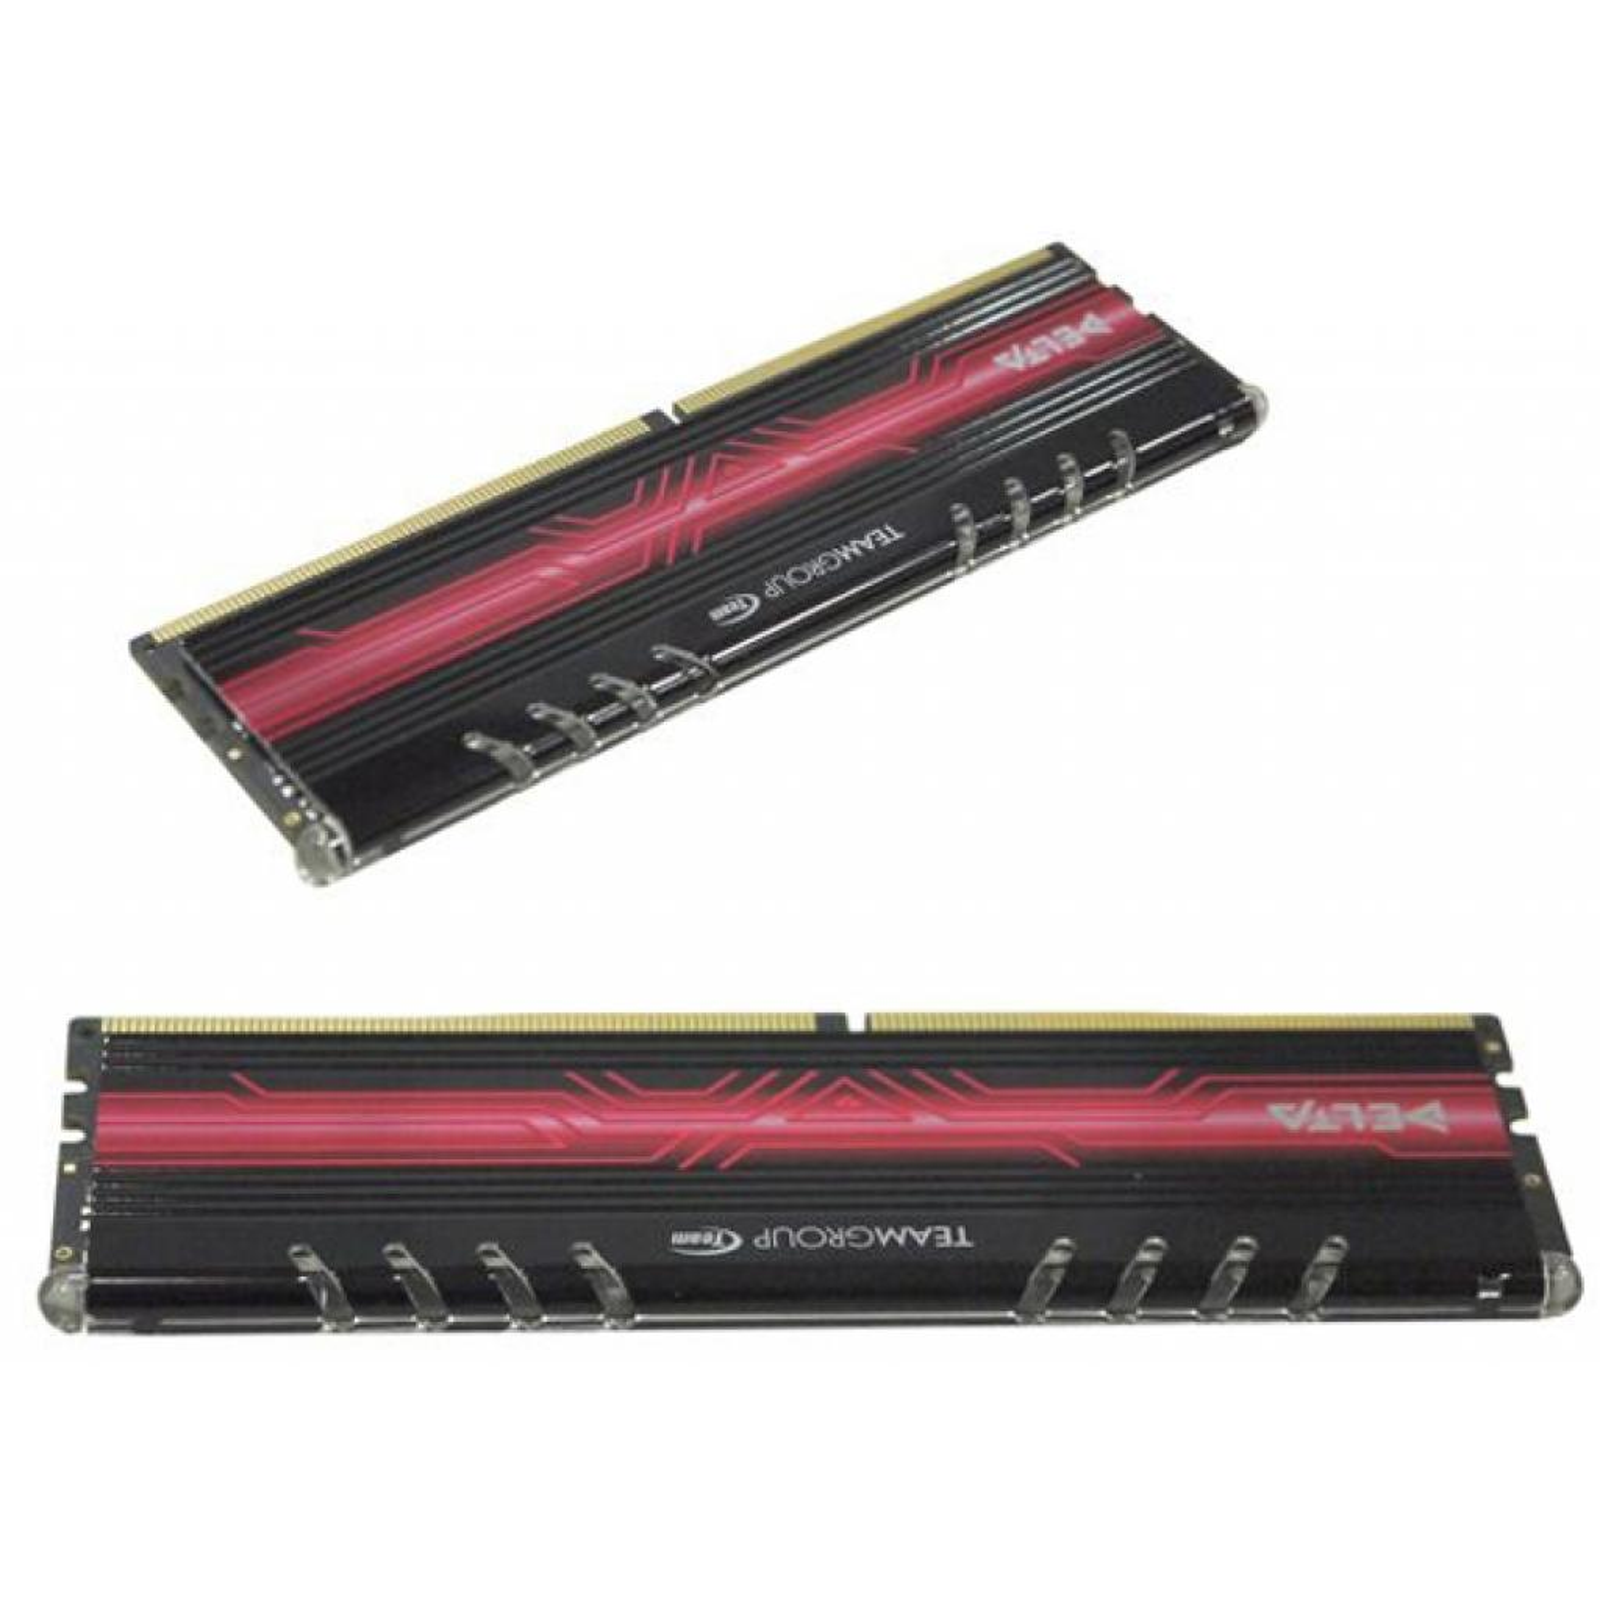 Модуль памяти для компьютера DDR4 8GB (2x4GB) 3000 MHz Delta Red LED Team (TDTRD48G3000HC16ADC01) изображение 2